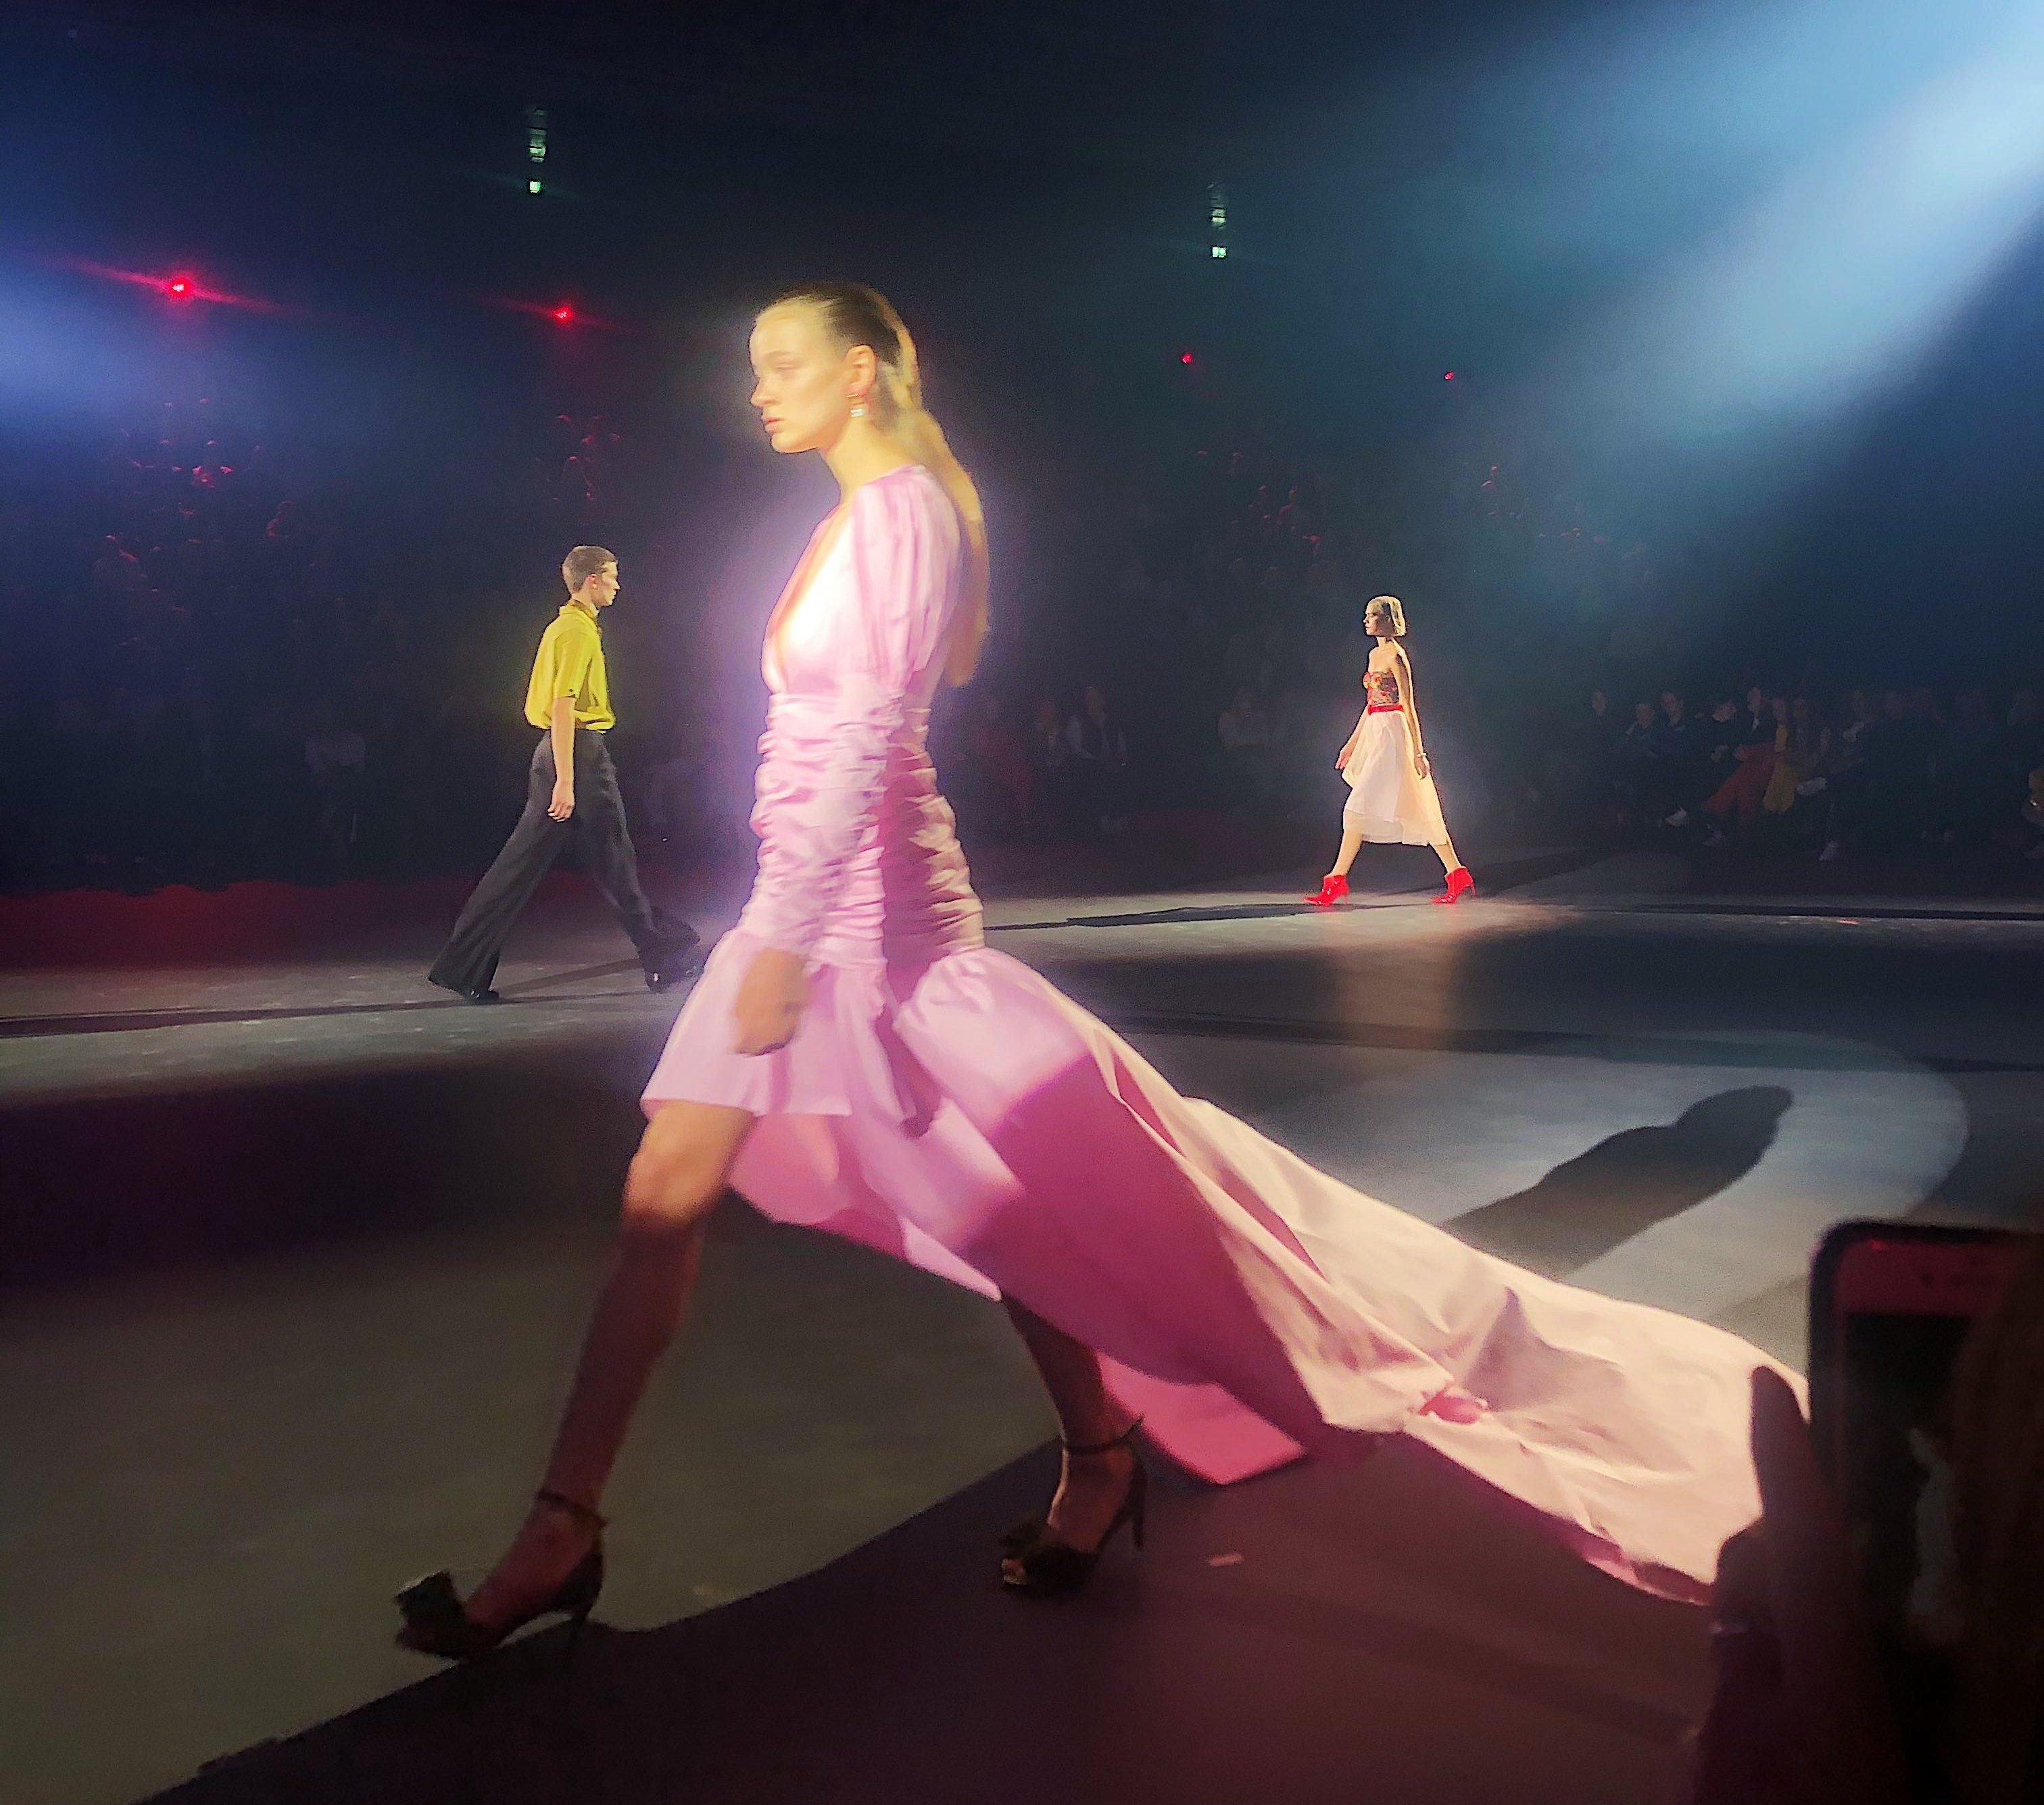 copenhagen fashion week, modeuge, københavn, fashion, mode, show